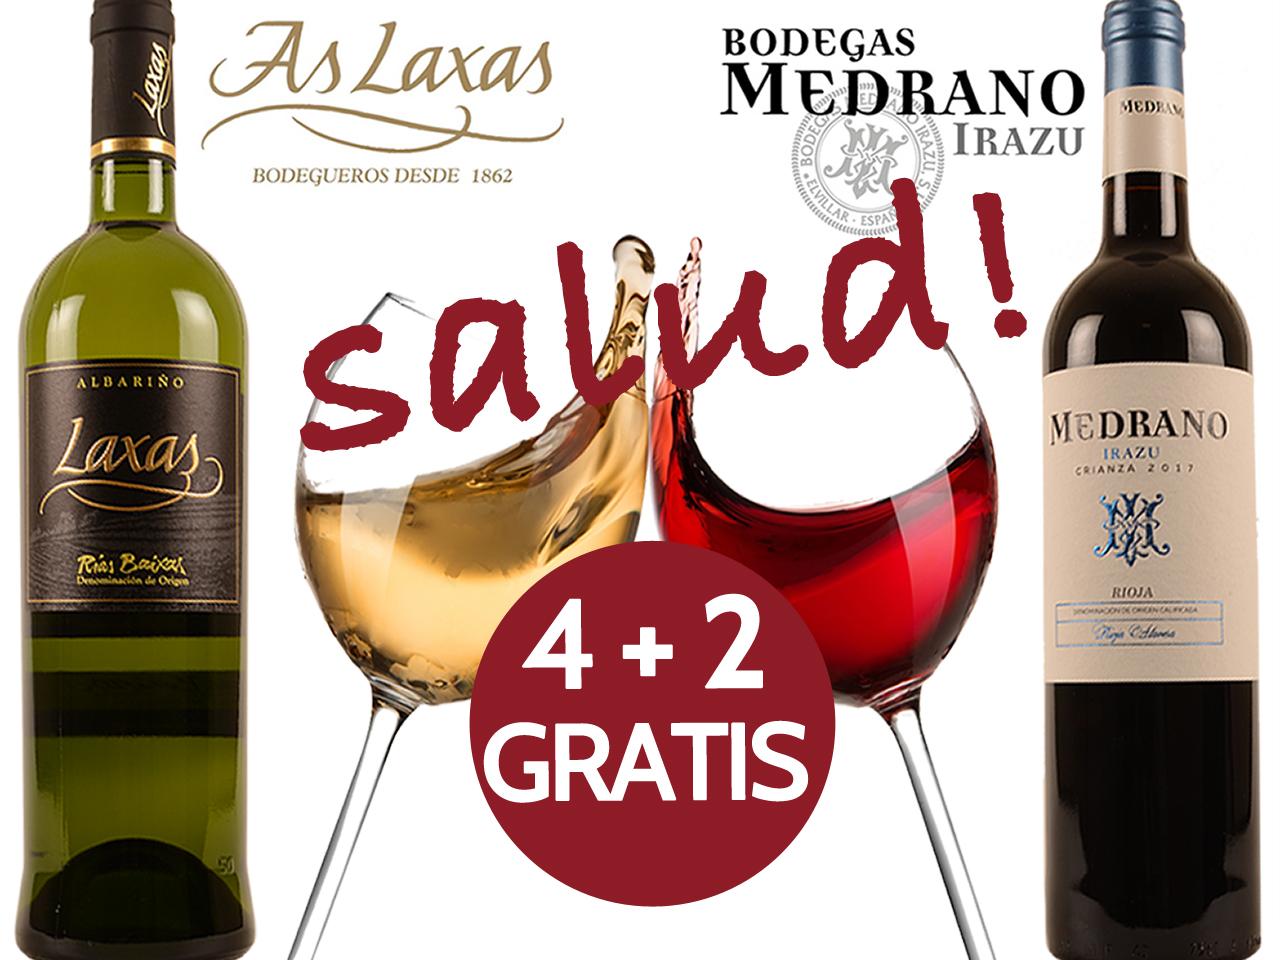 Promo 4+2 gratis Spaanse toppers beste As Laxas Albarino Rioja Crianza